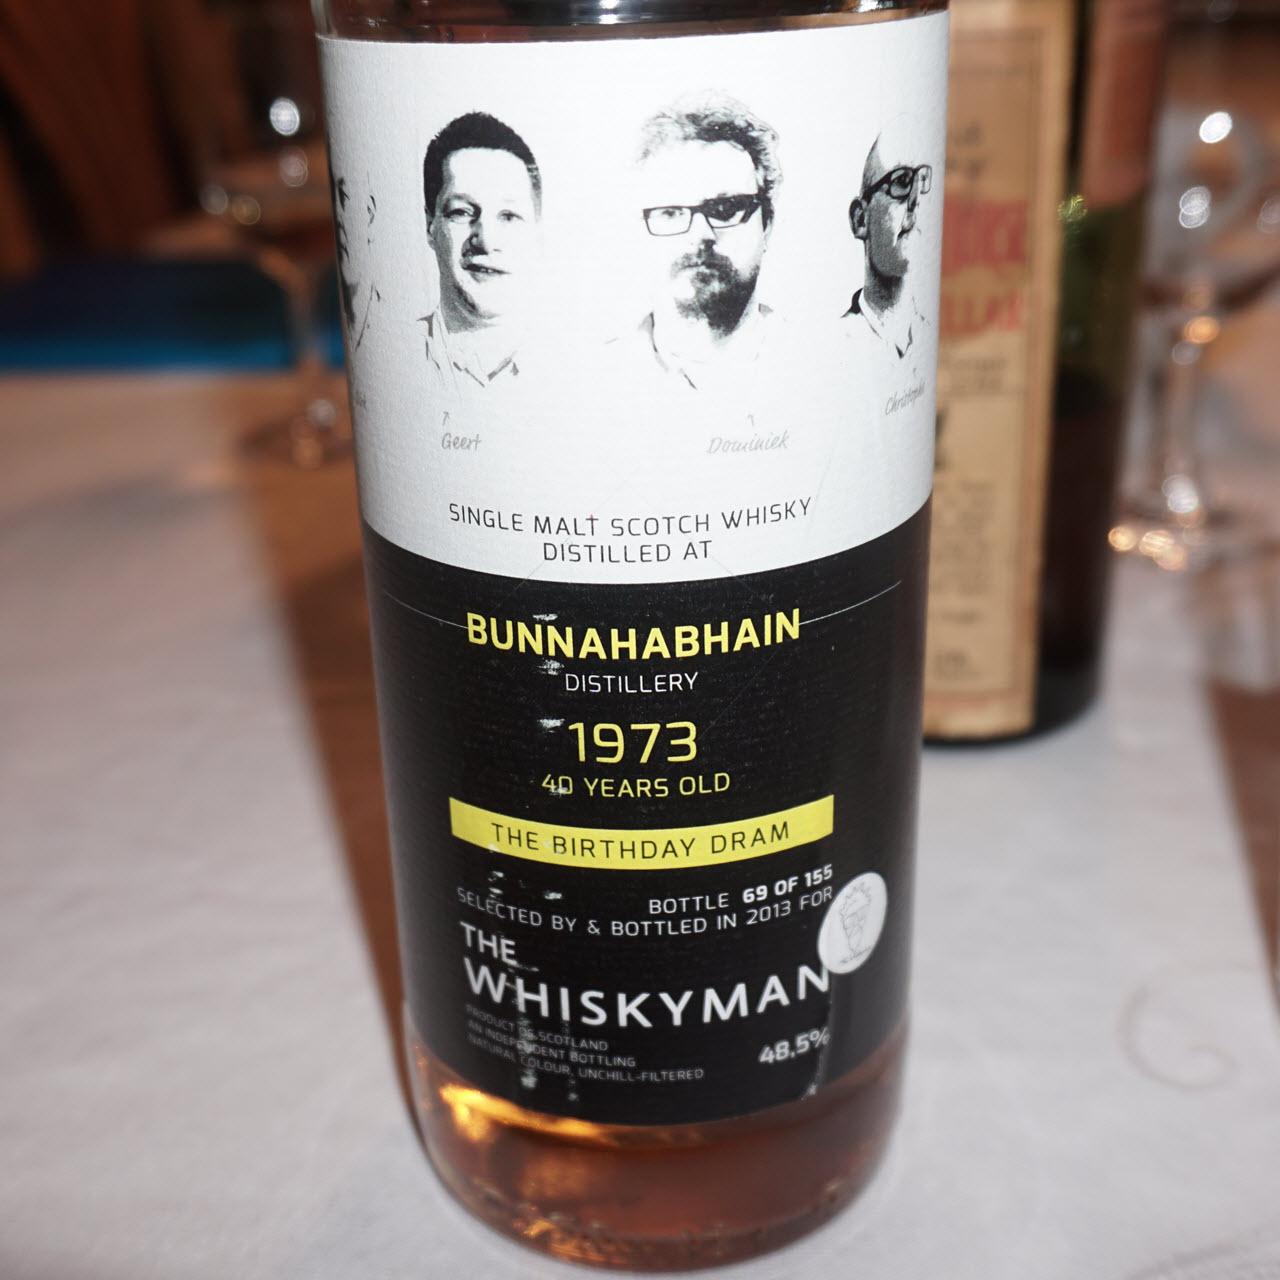 Bunnahabhain 1973 40 YO The Birthday Dram